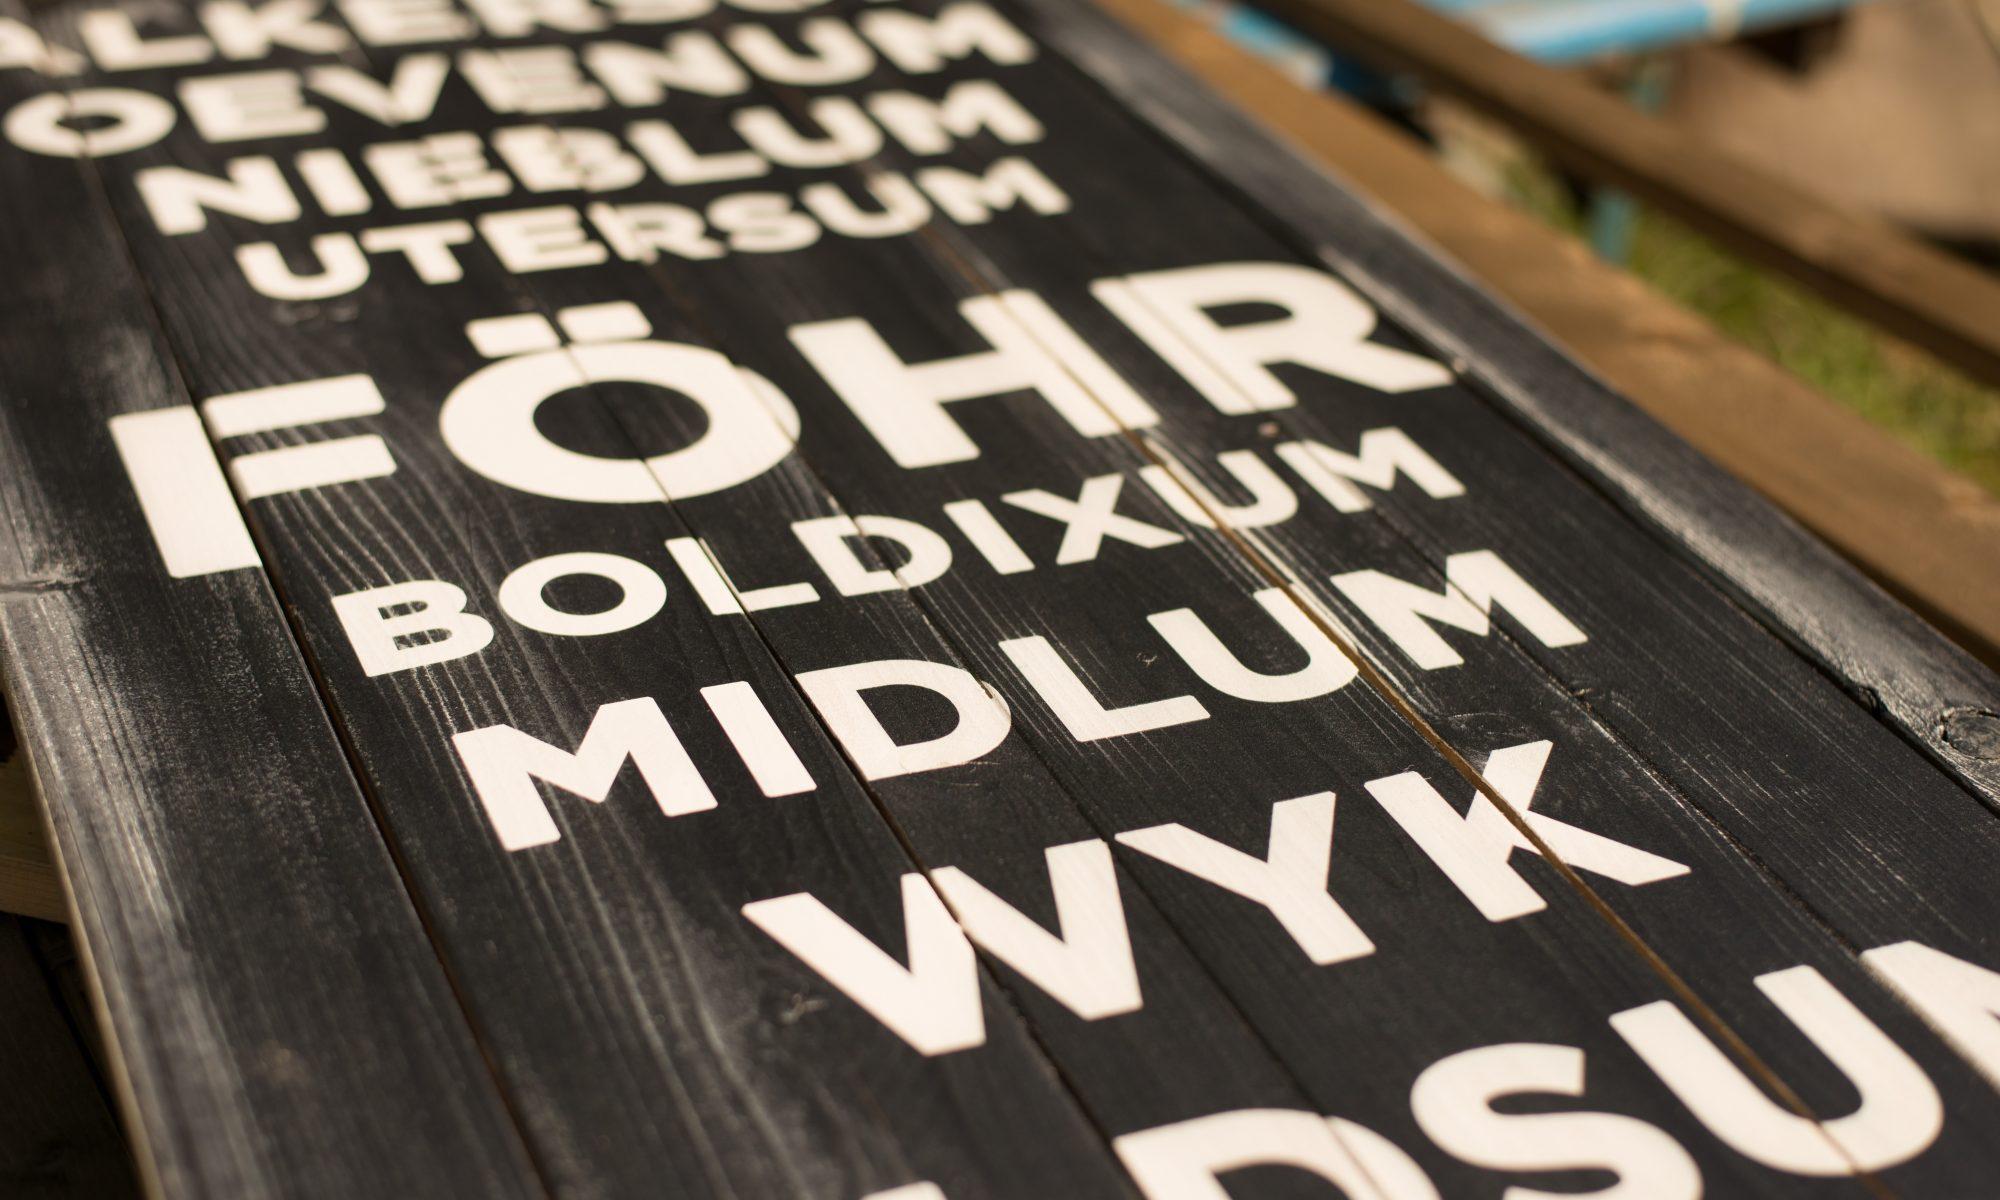 Grafikdruck auf Holzlatten